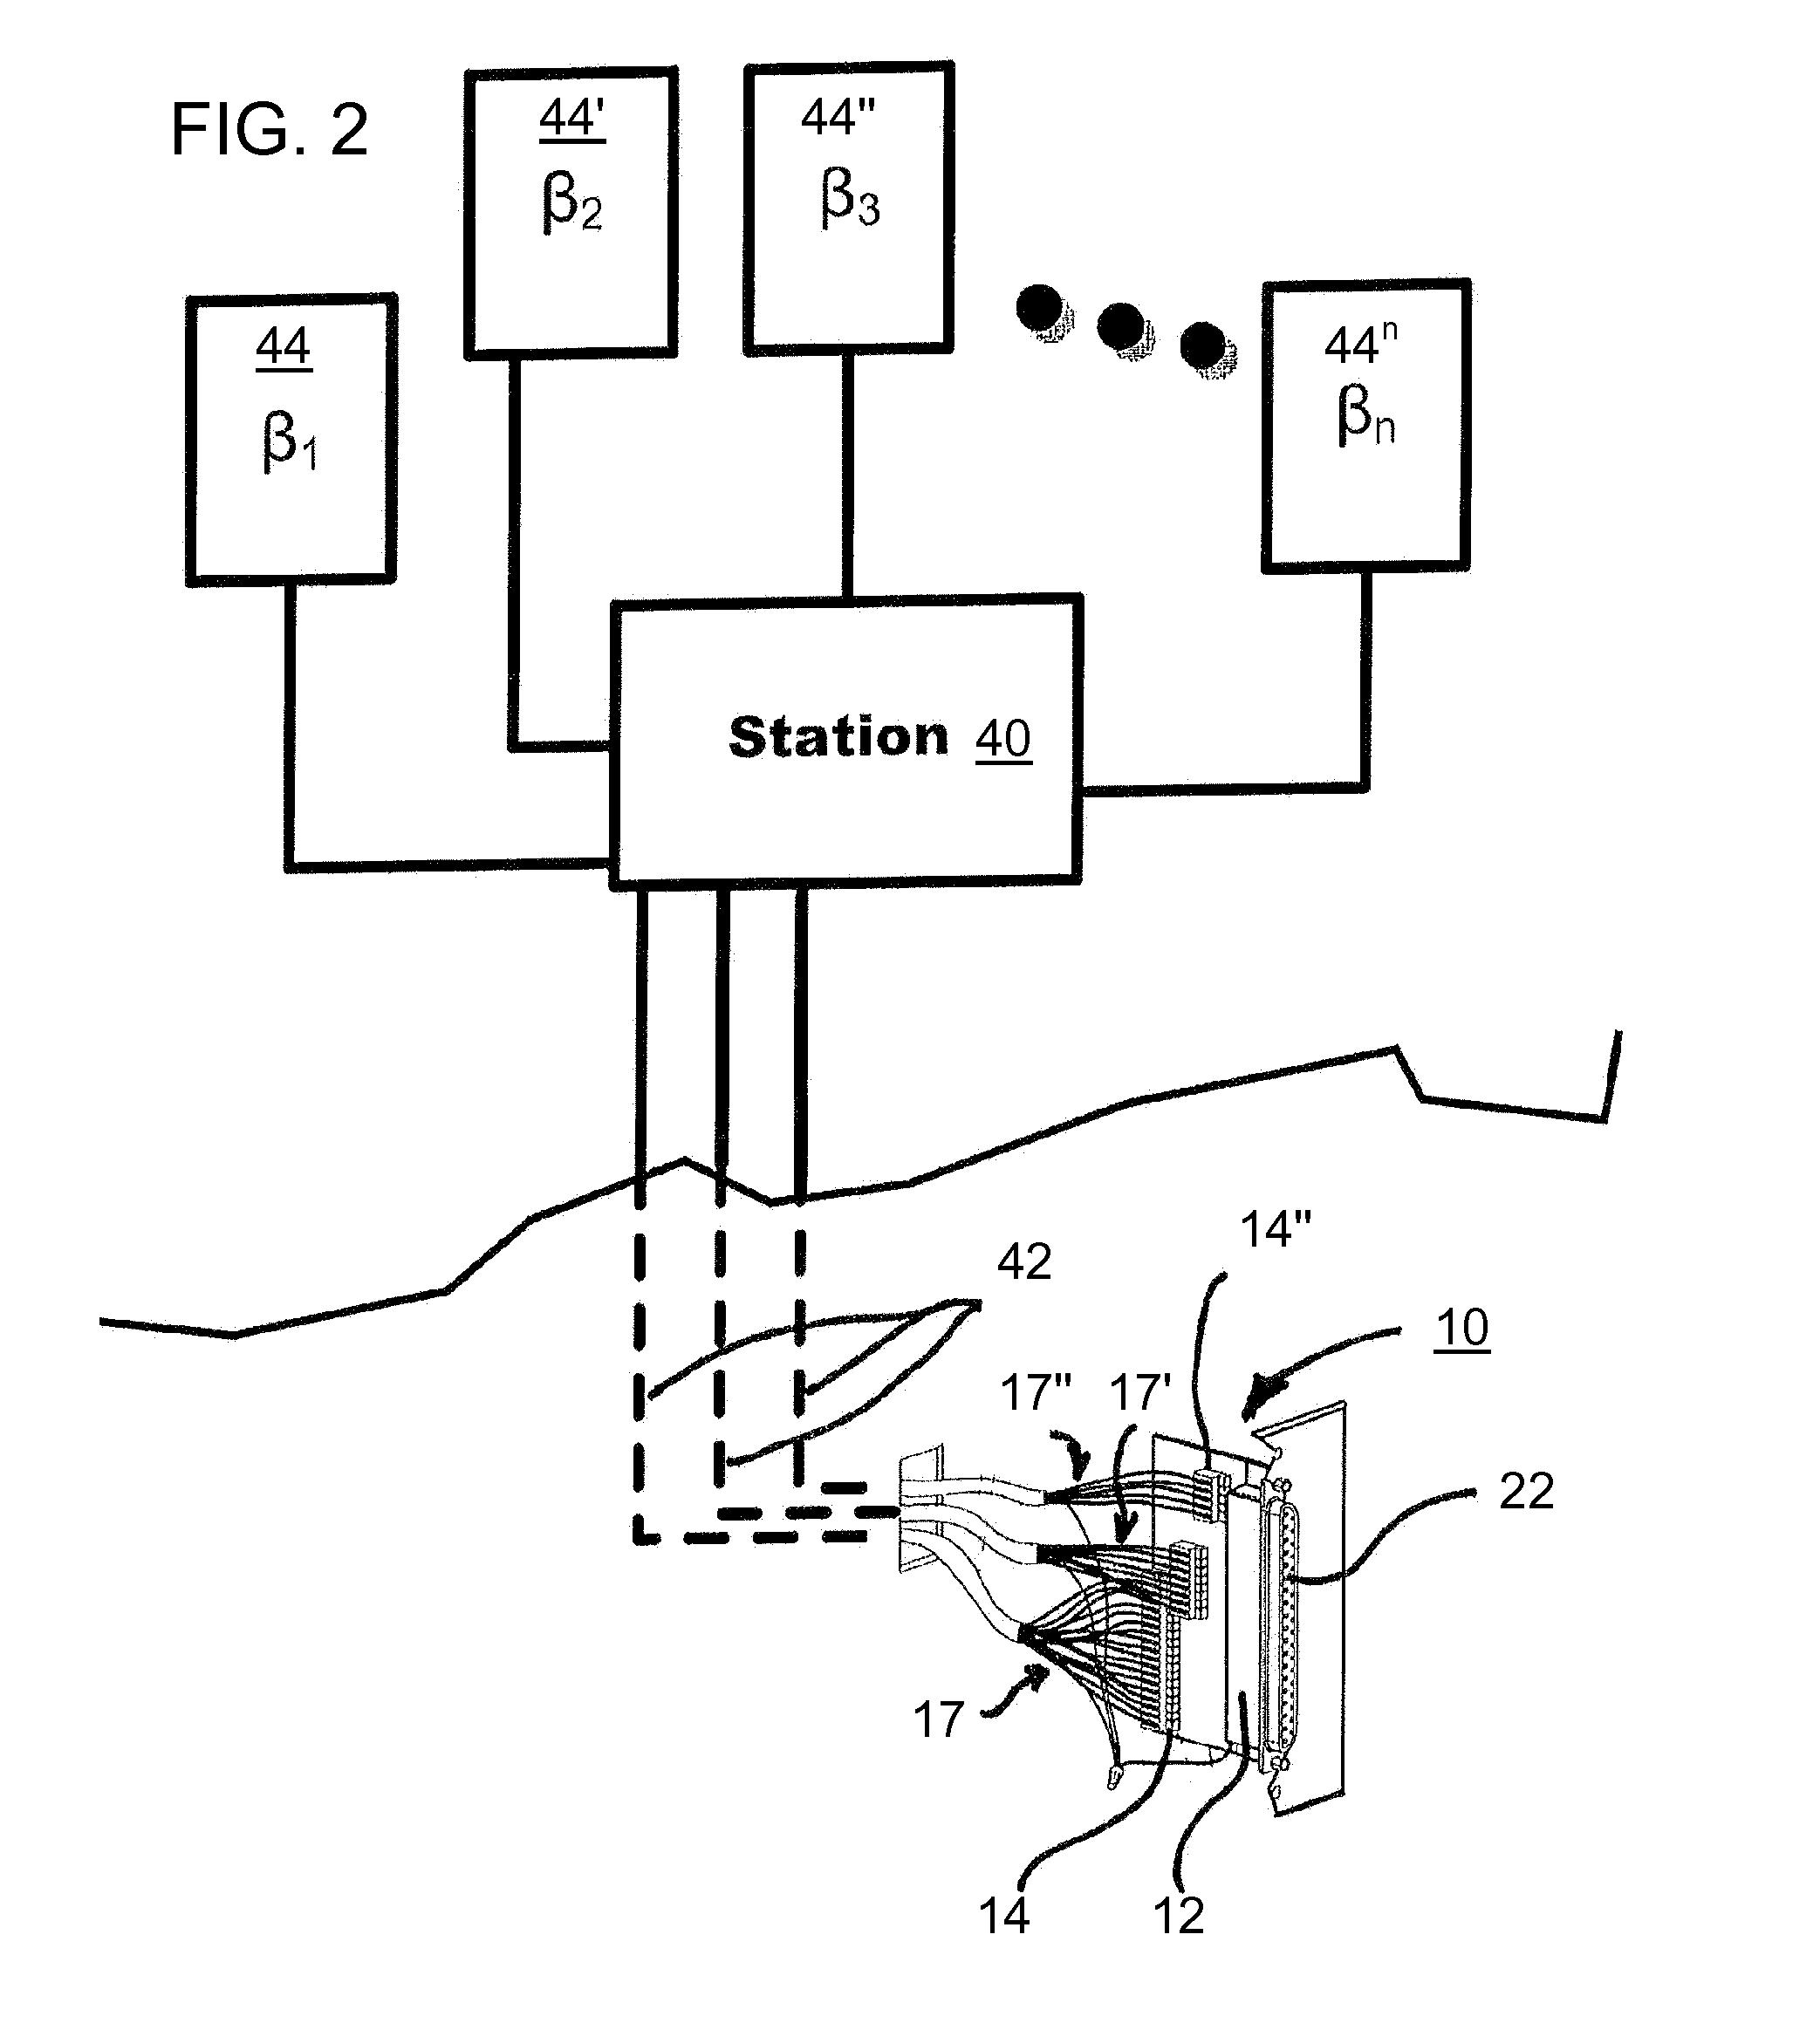 US08096813 20120117 D00002?resize=665%2C744 jeron nurse call wiring diagram wiring diagram Basic Electrical Wiring Diagrams at honlapkeszites.co